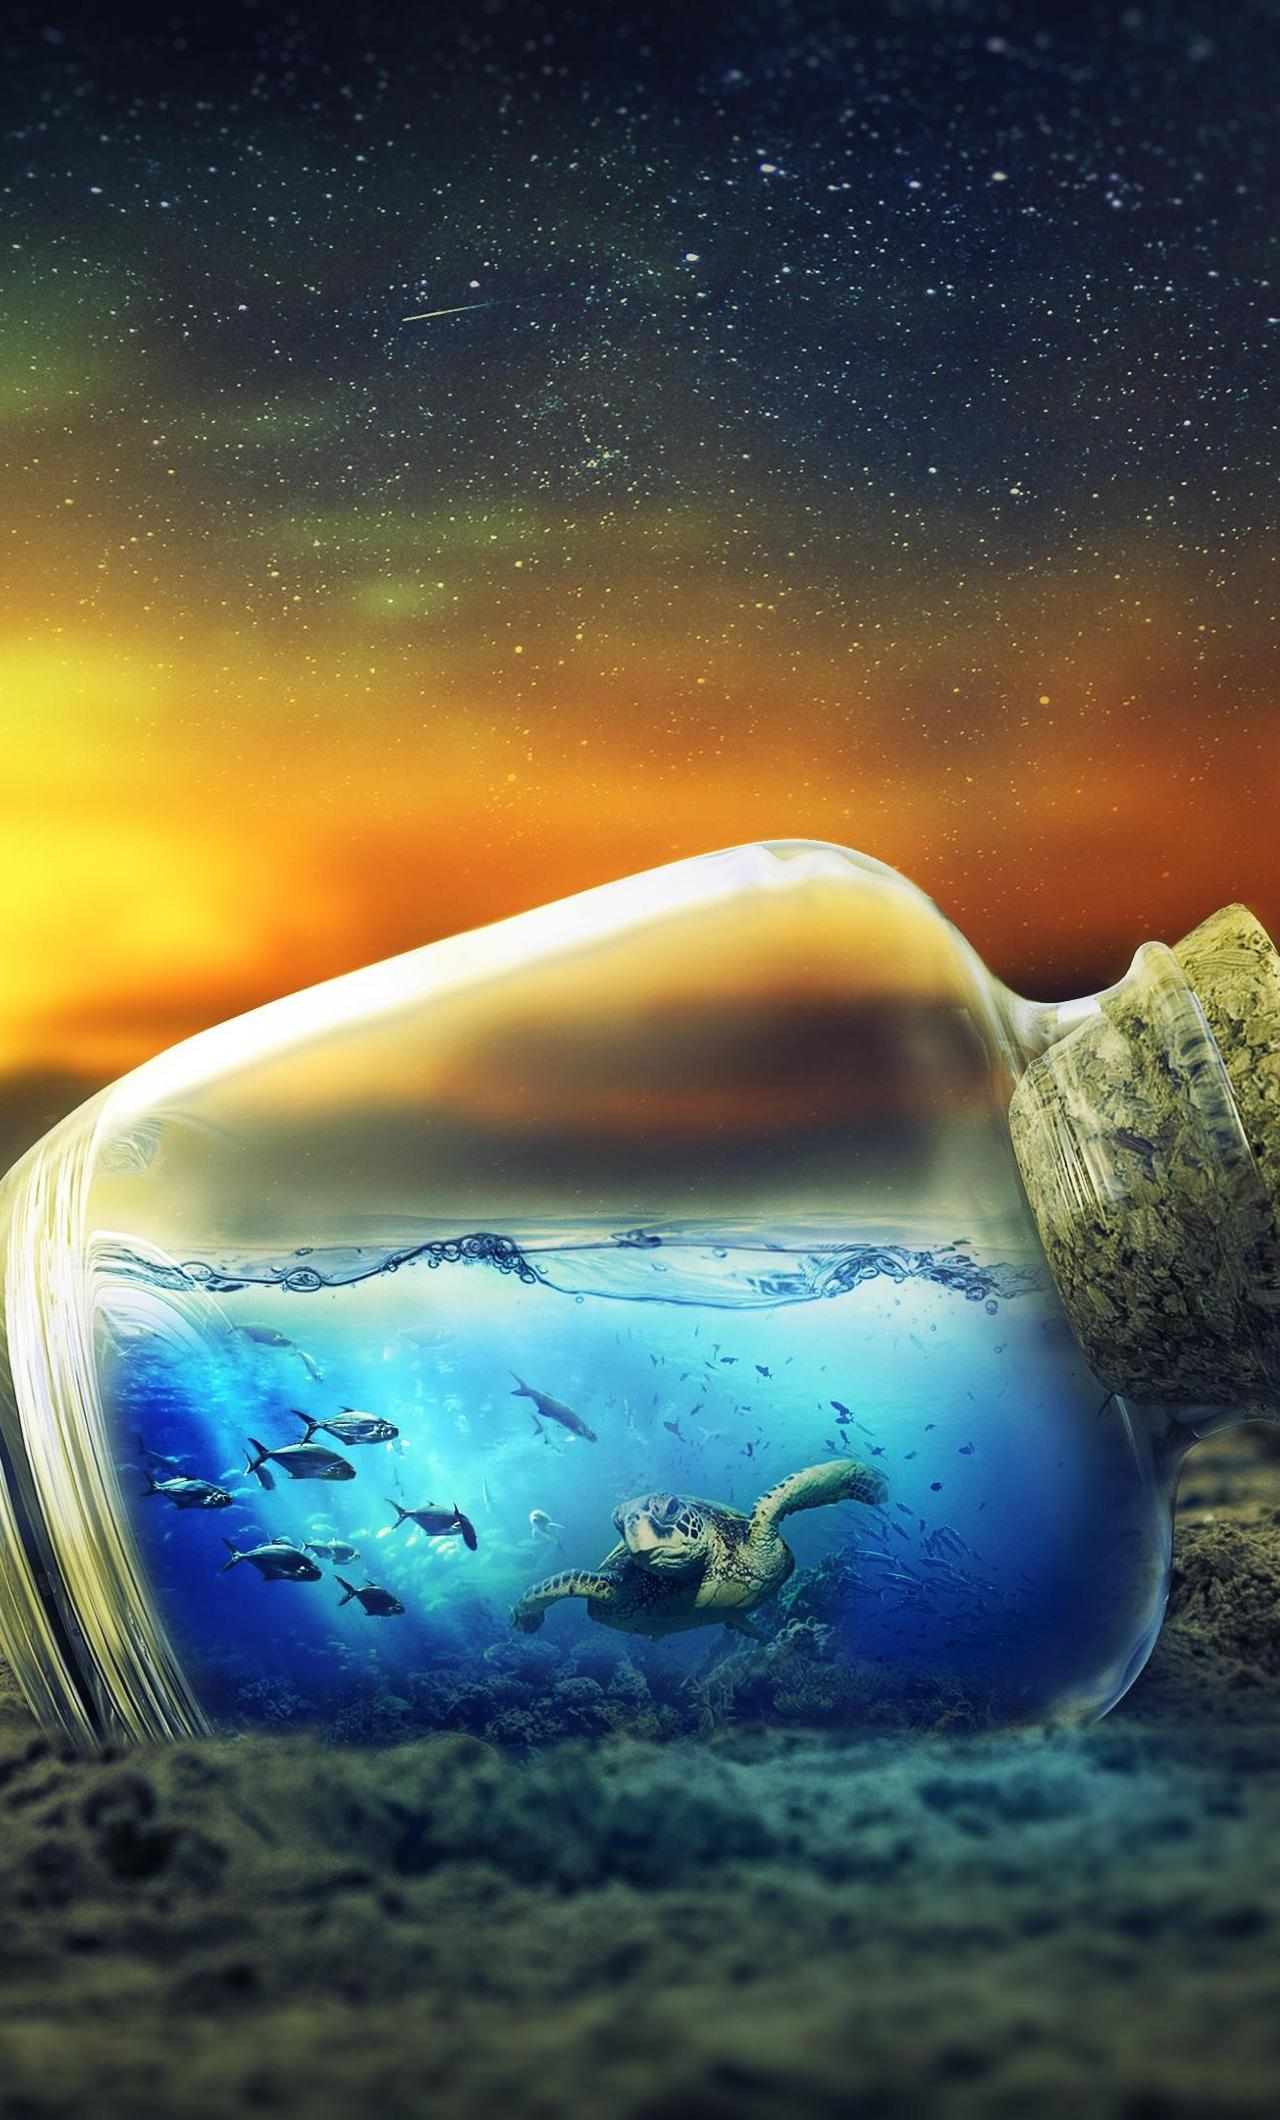 Underwater Sunset, HD 4K Wallpaper